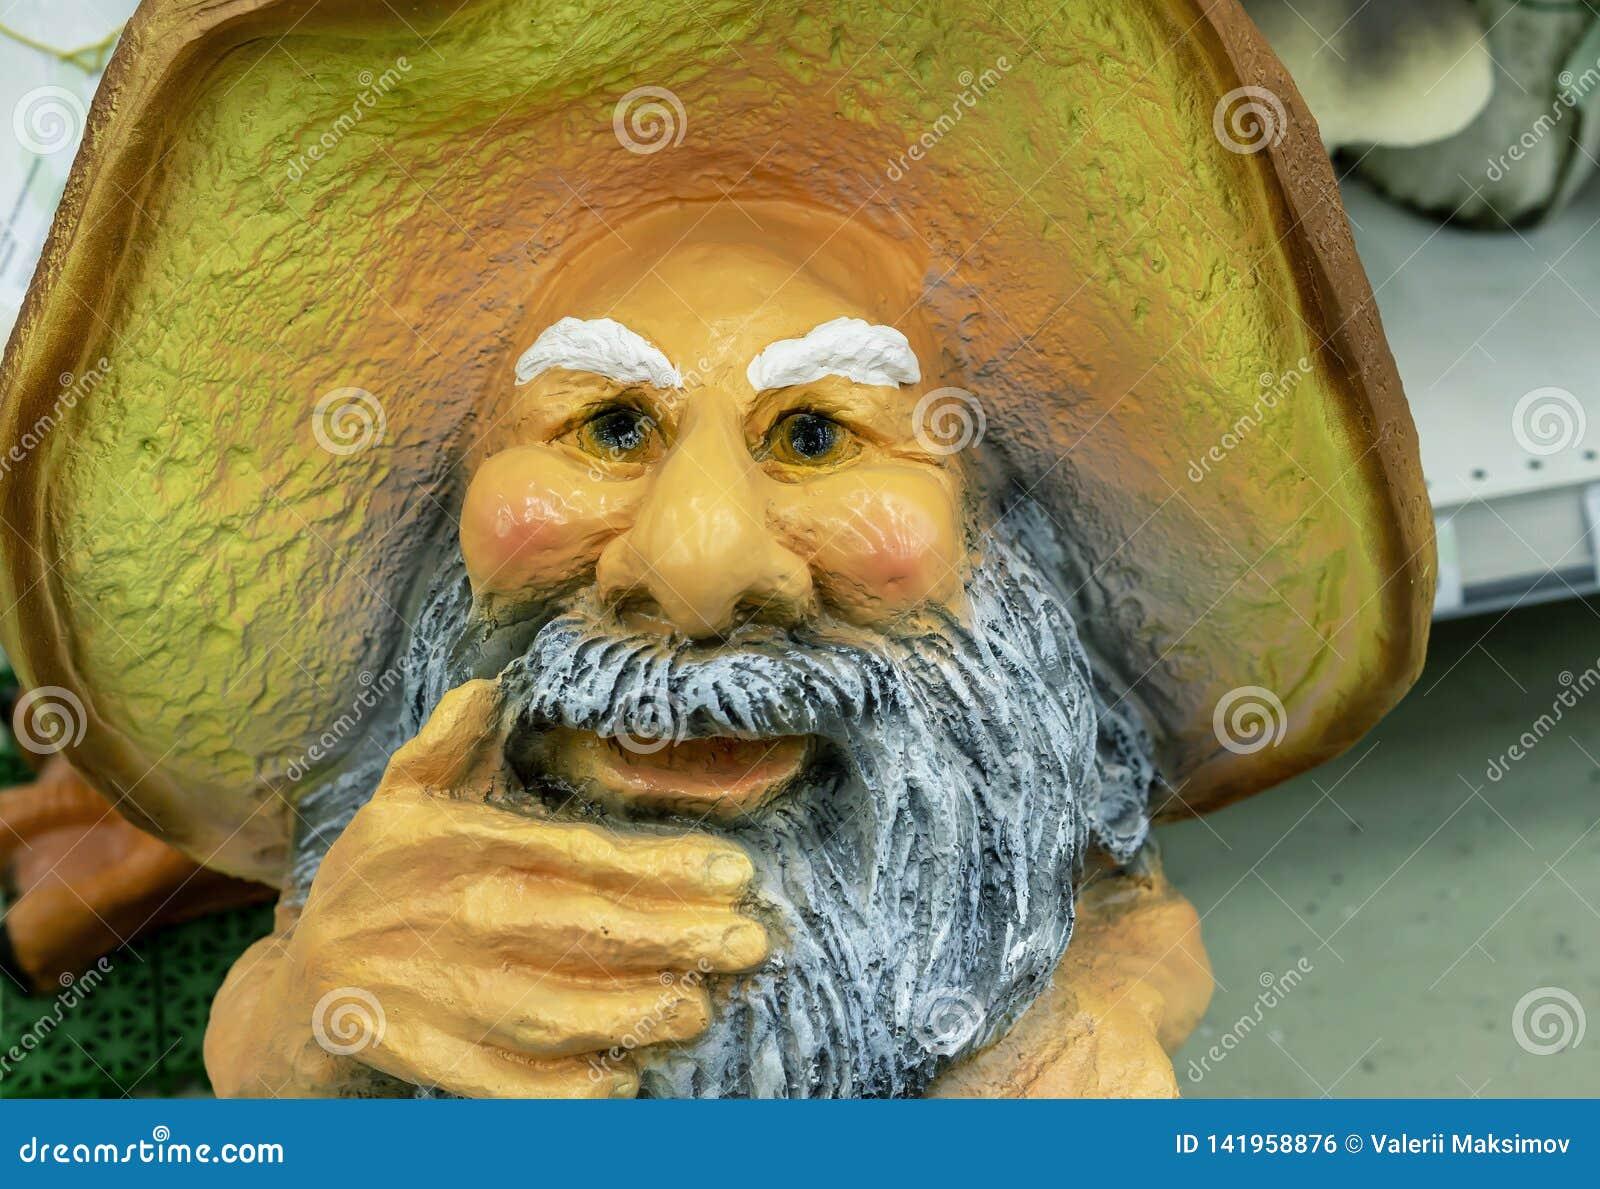 Garden sculpture of mushroom grandfather from Russian folk tales